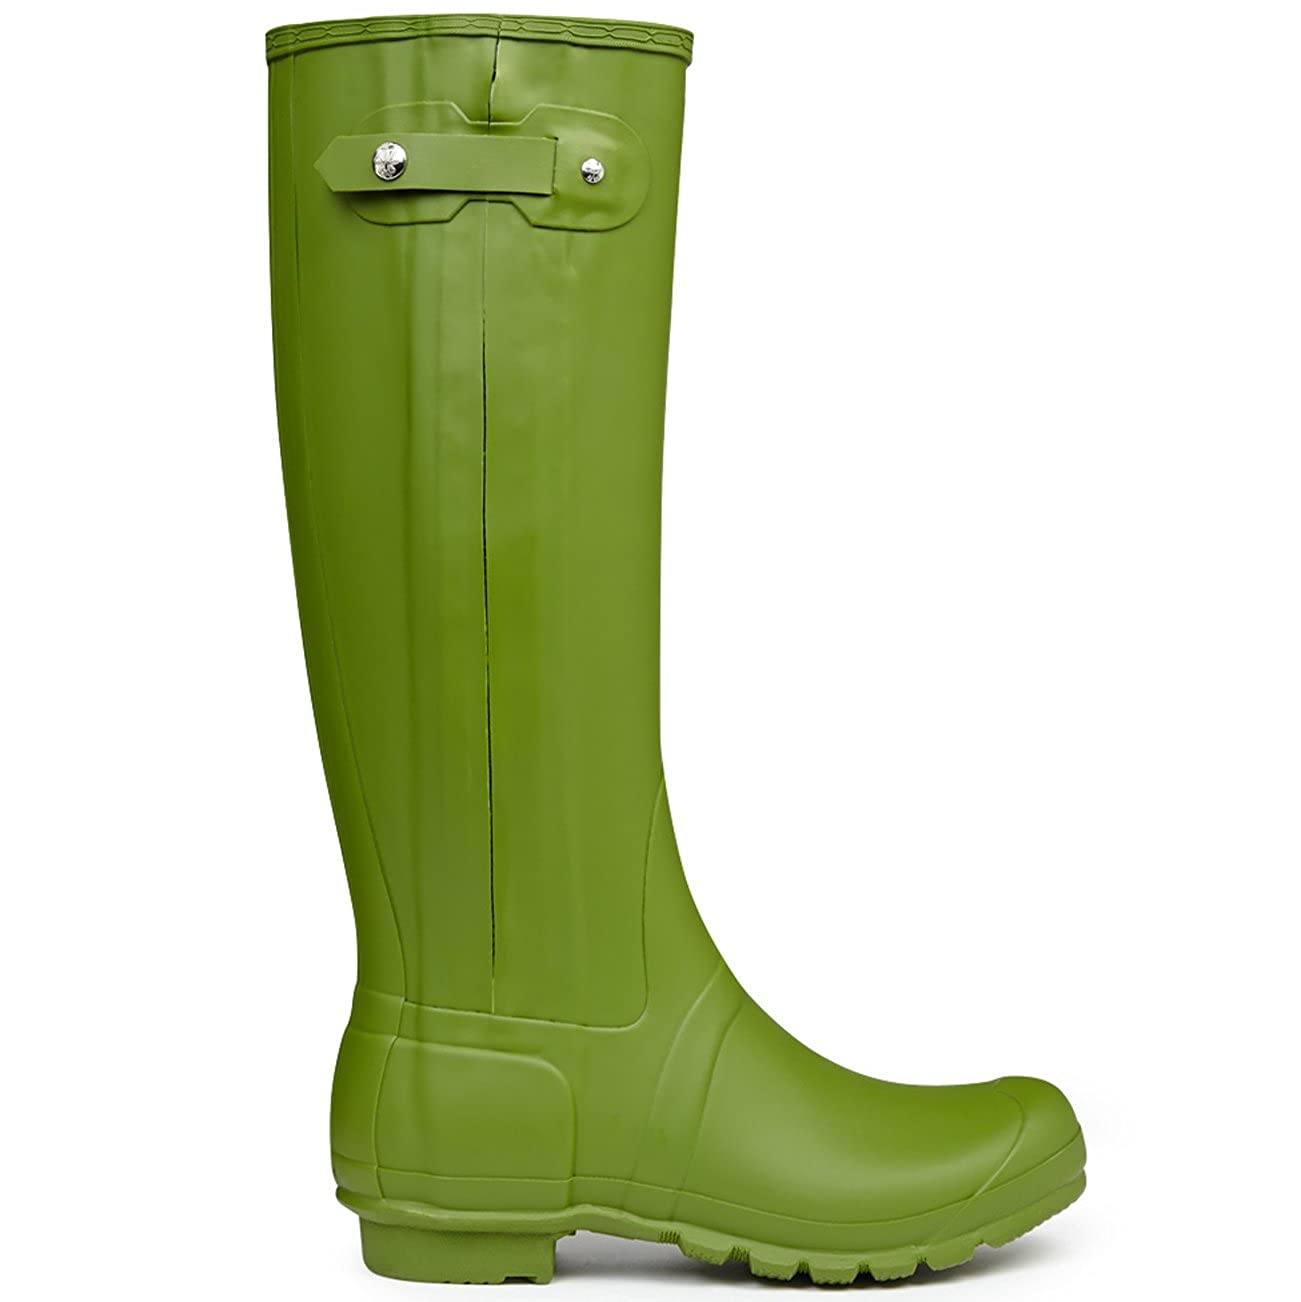 new product 622b3 18e16 hunter Womens Original Slim Zip Winter Festival Rain ...